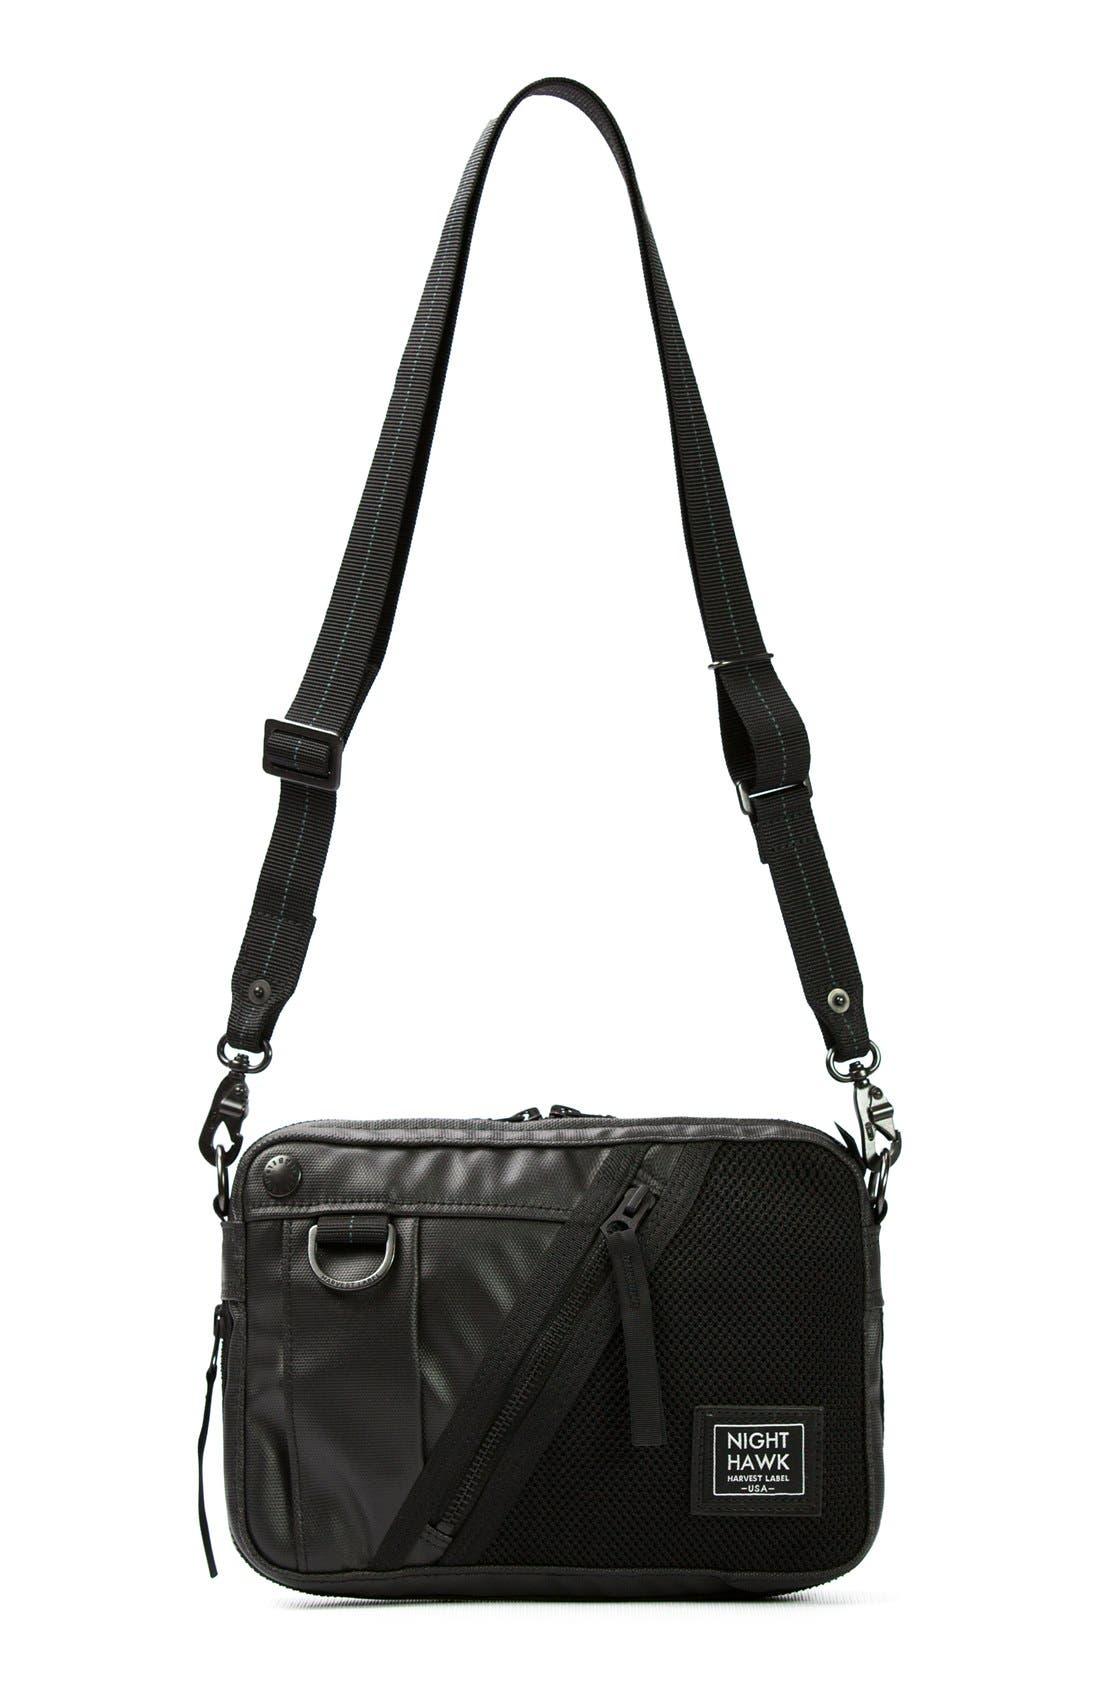 'NightHawk' Shoulder Bag,                             Main thumbnail 1, color,                             Black